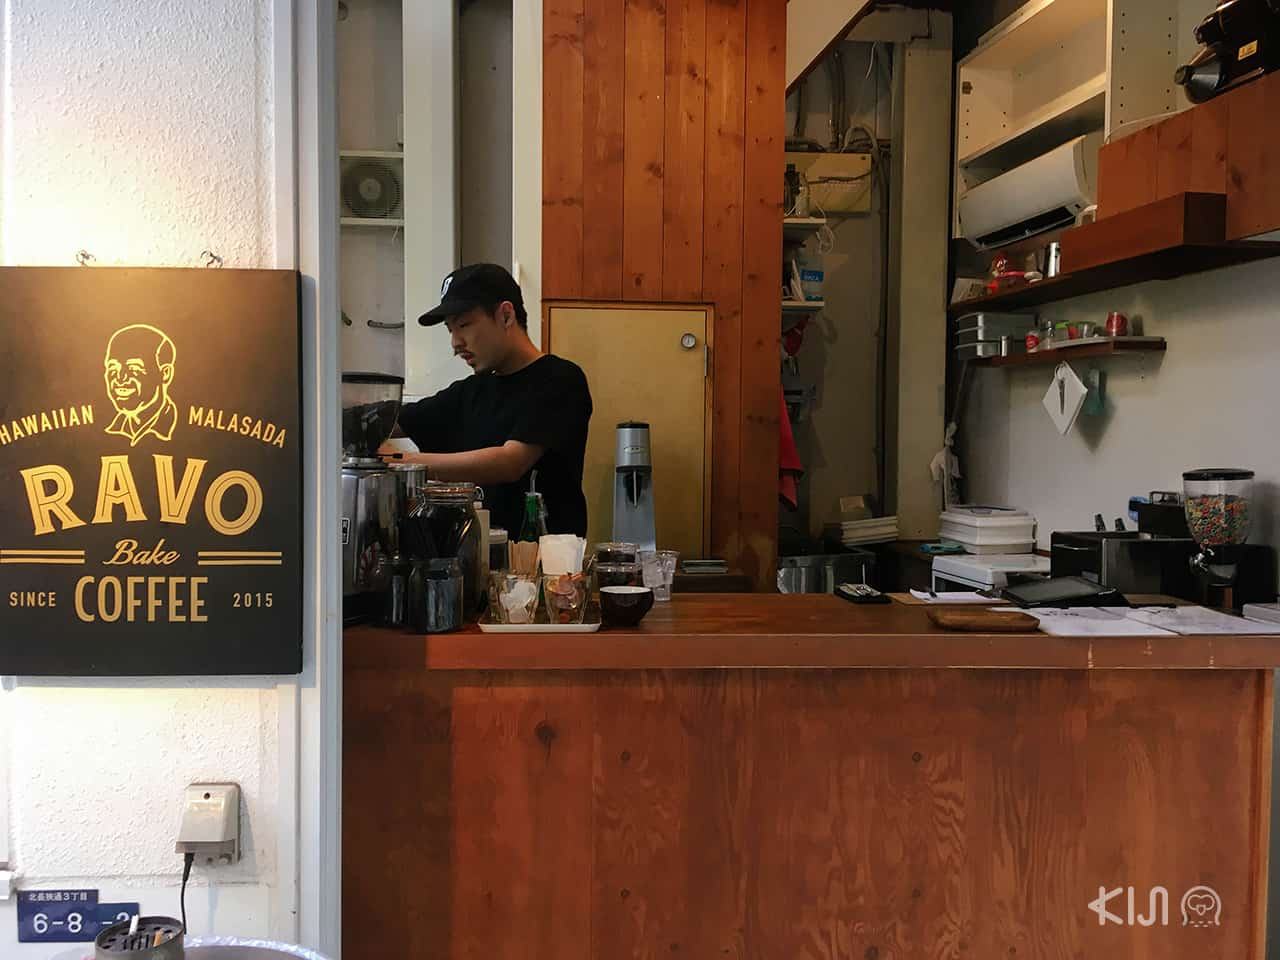 Ravo Bake Coffee, Kobe Motomachi